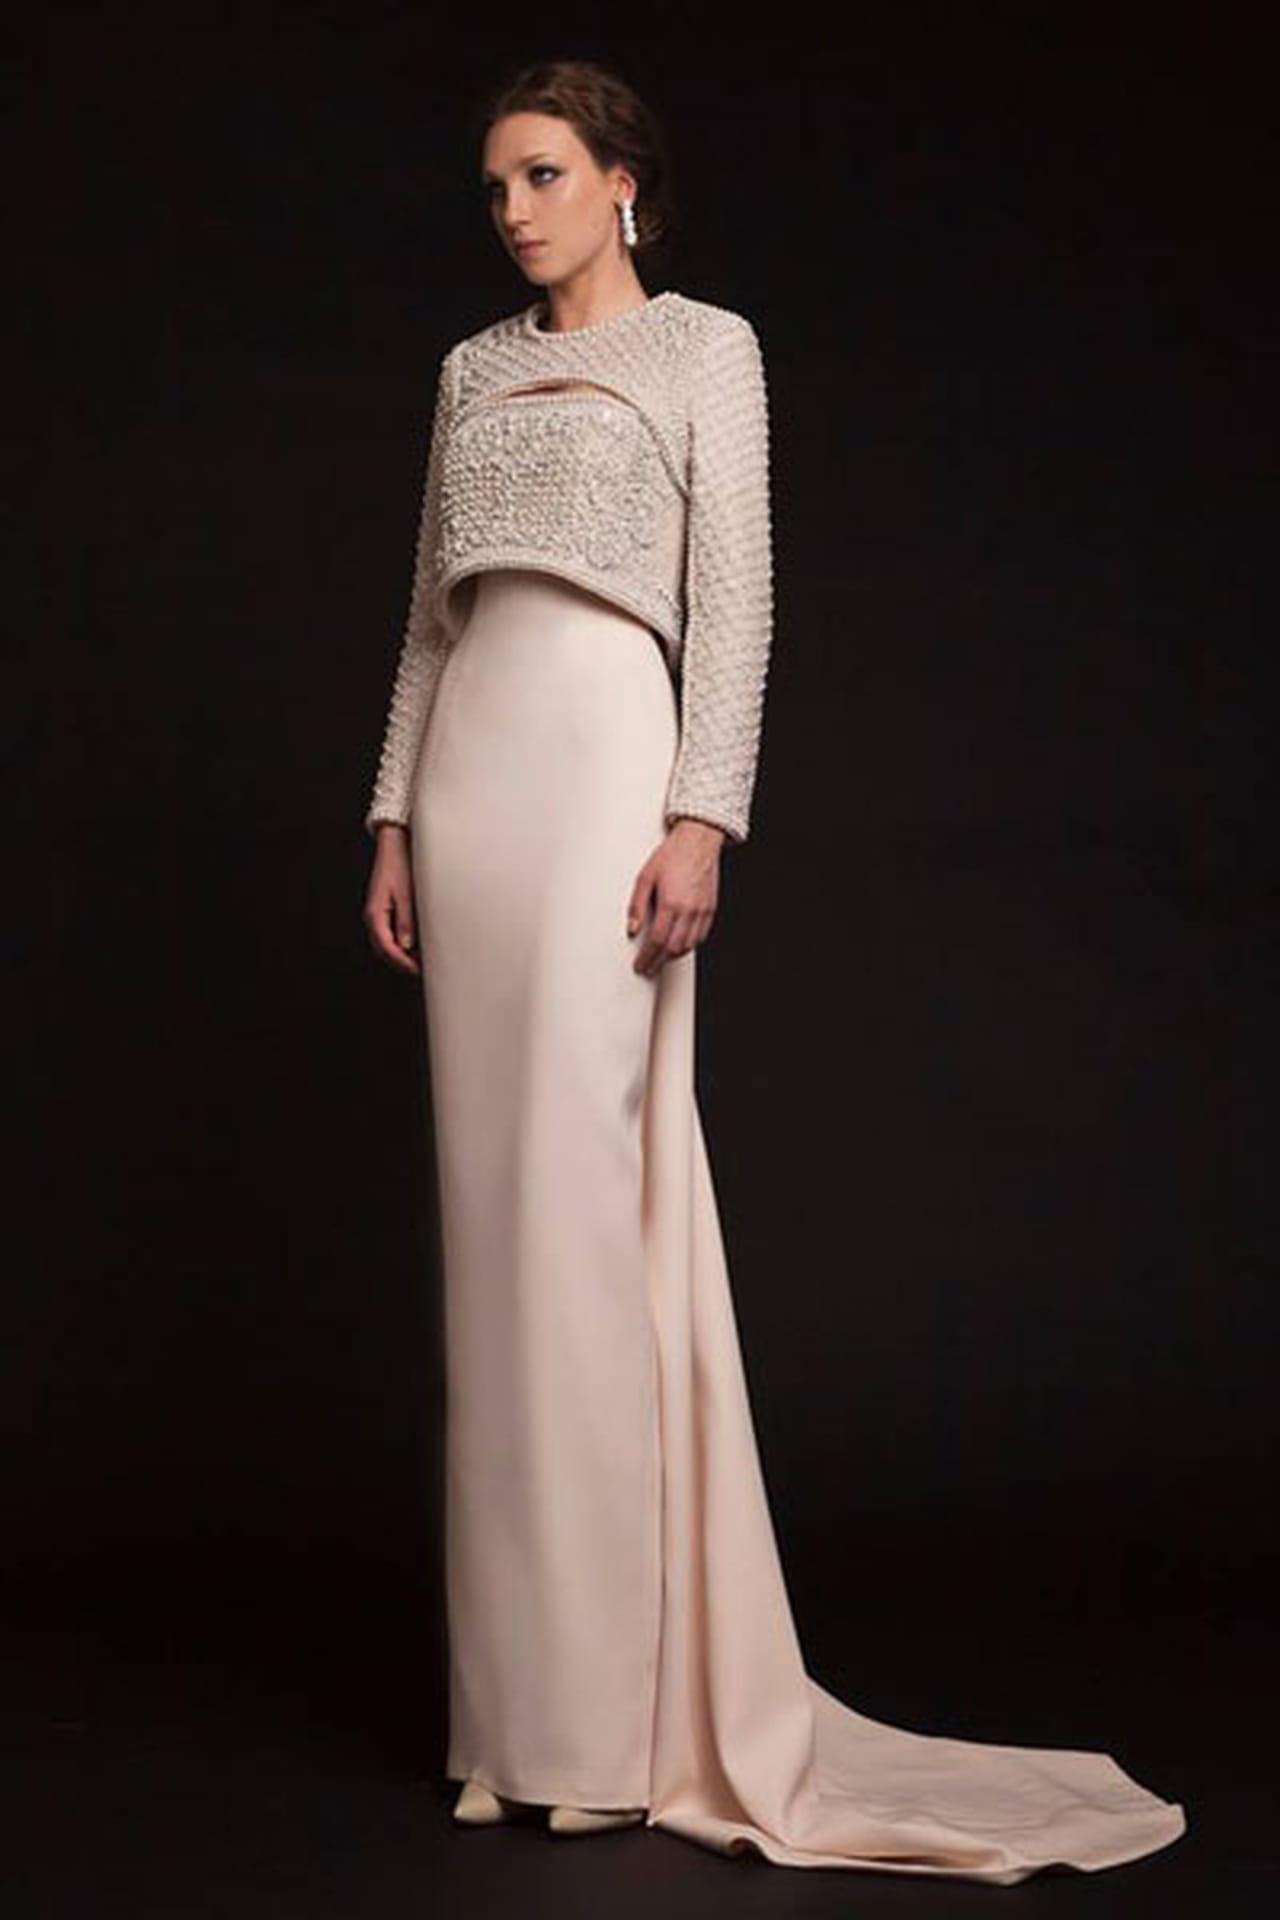 805a5356be39a فساتين سهرة بأكمام 2015 من توقيع مصممين أزياء عرب